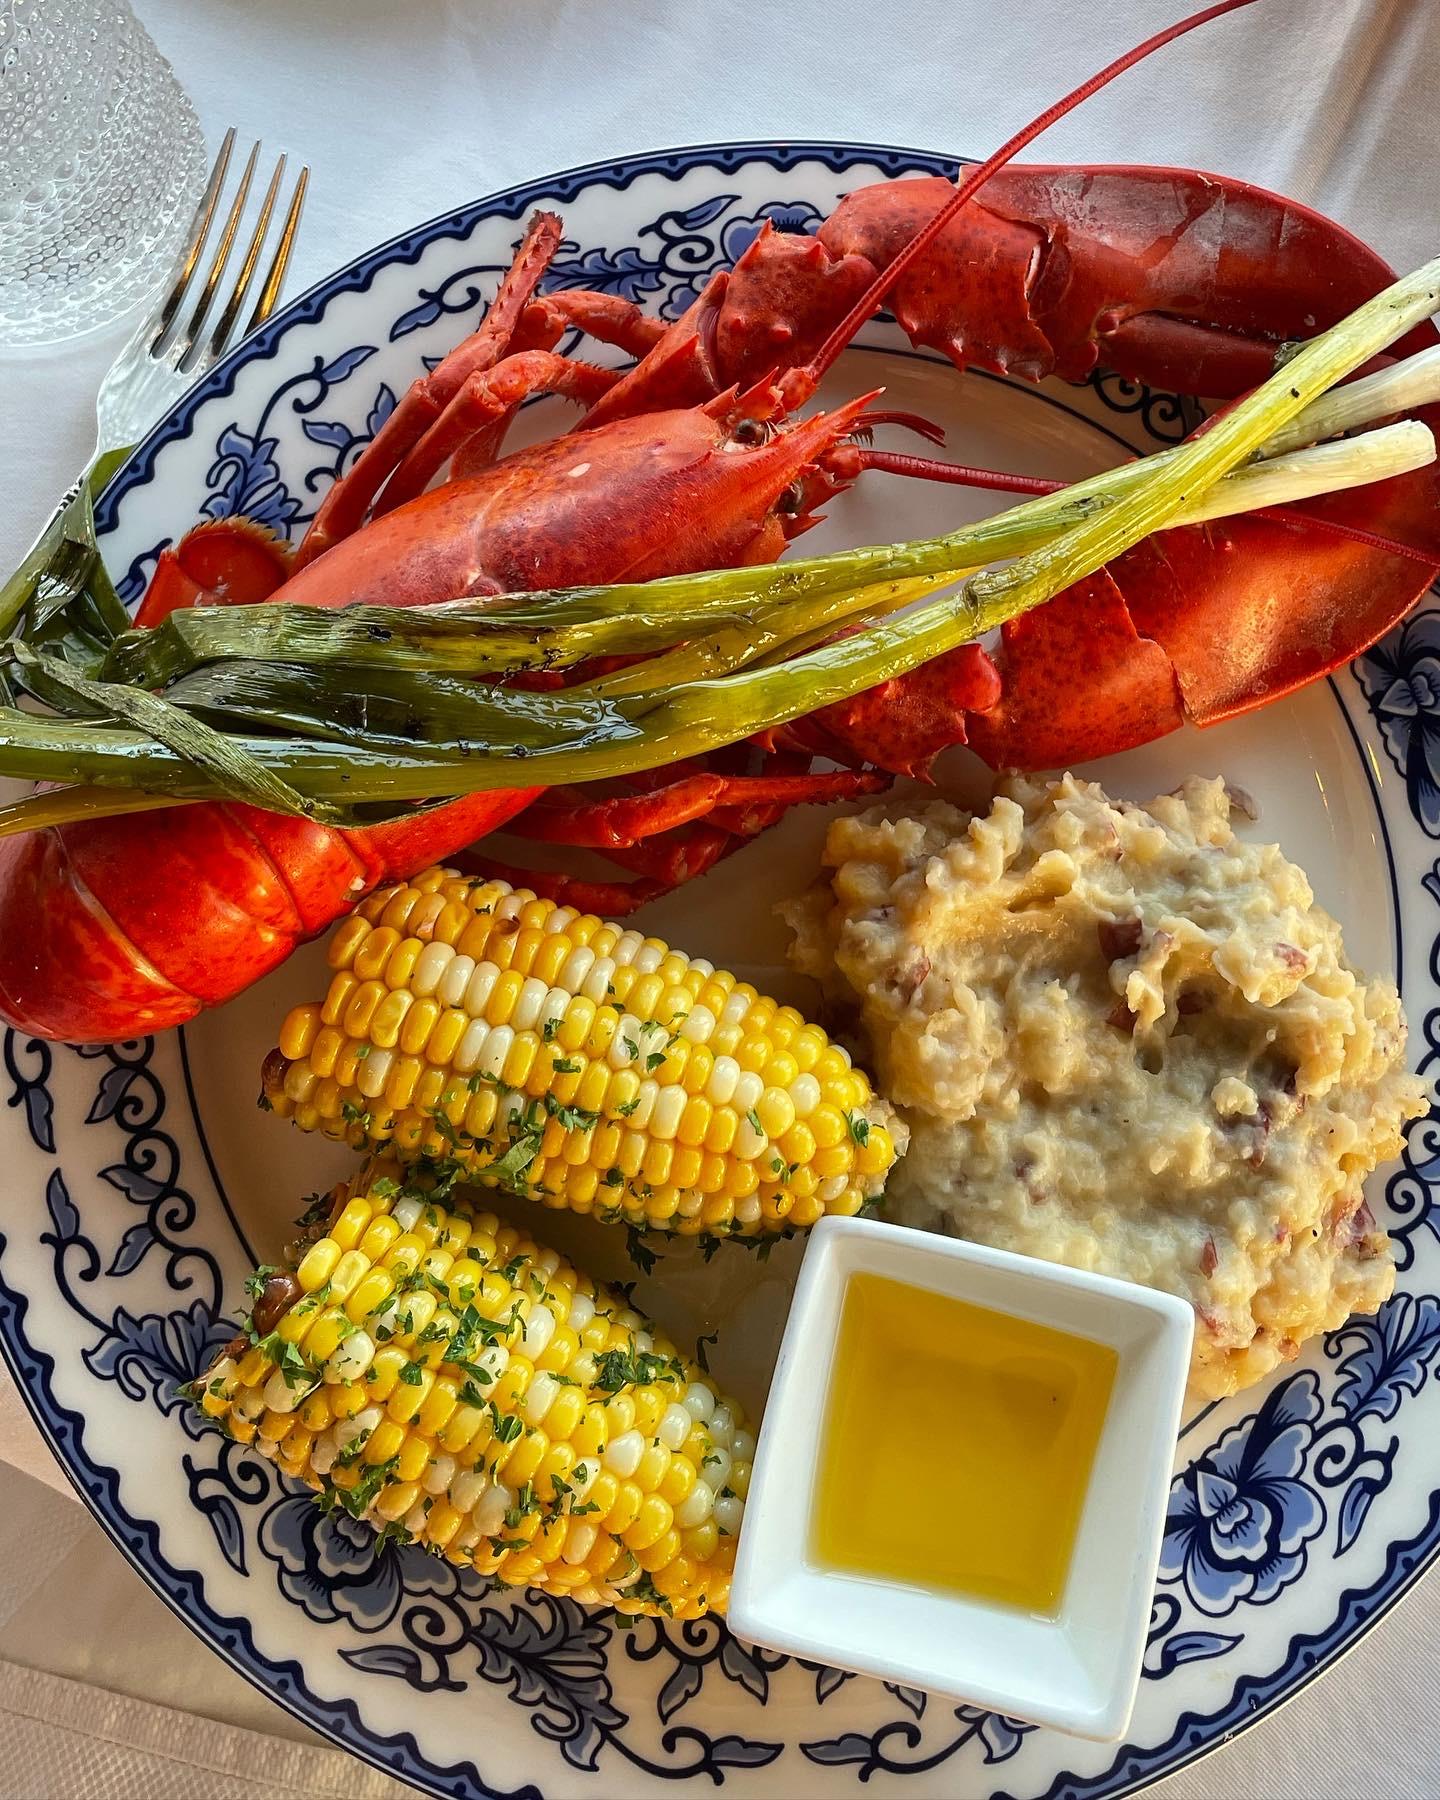 Grilled Lobster dinner at Spruce Point Inn